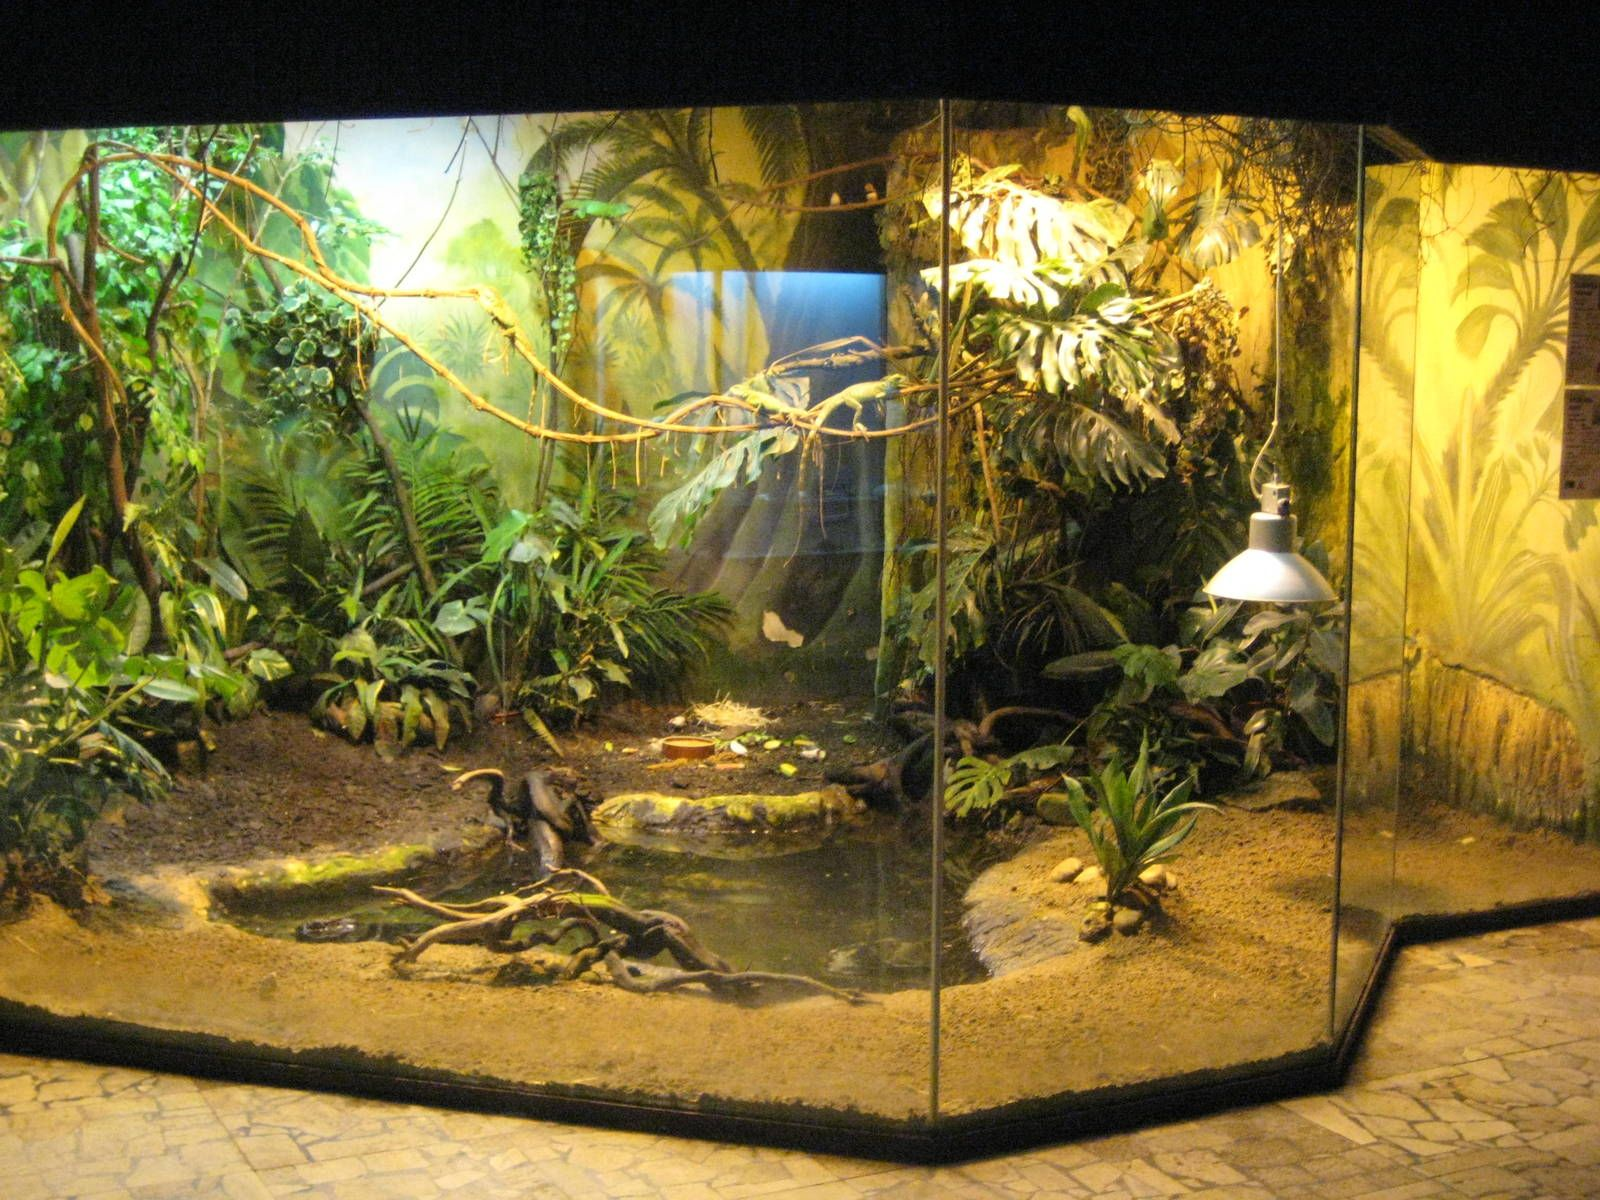 Reptile Habitat Patio Living room   someday